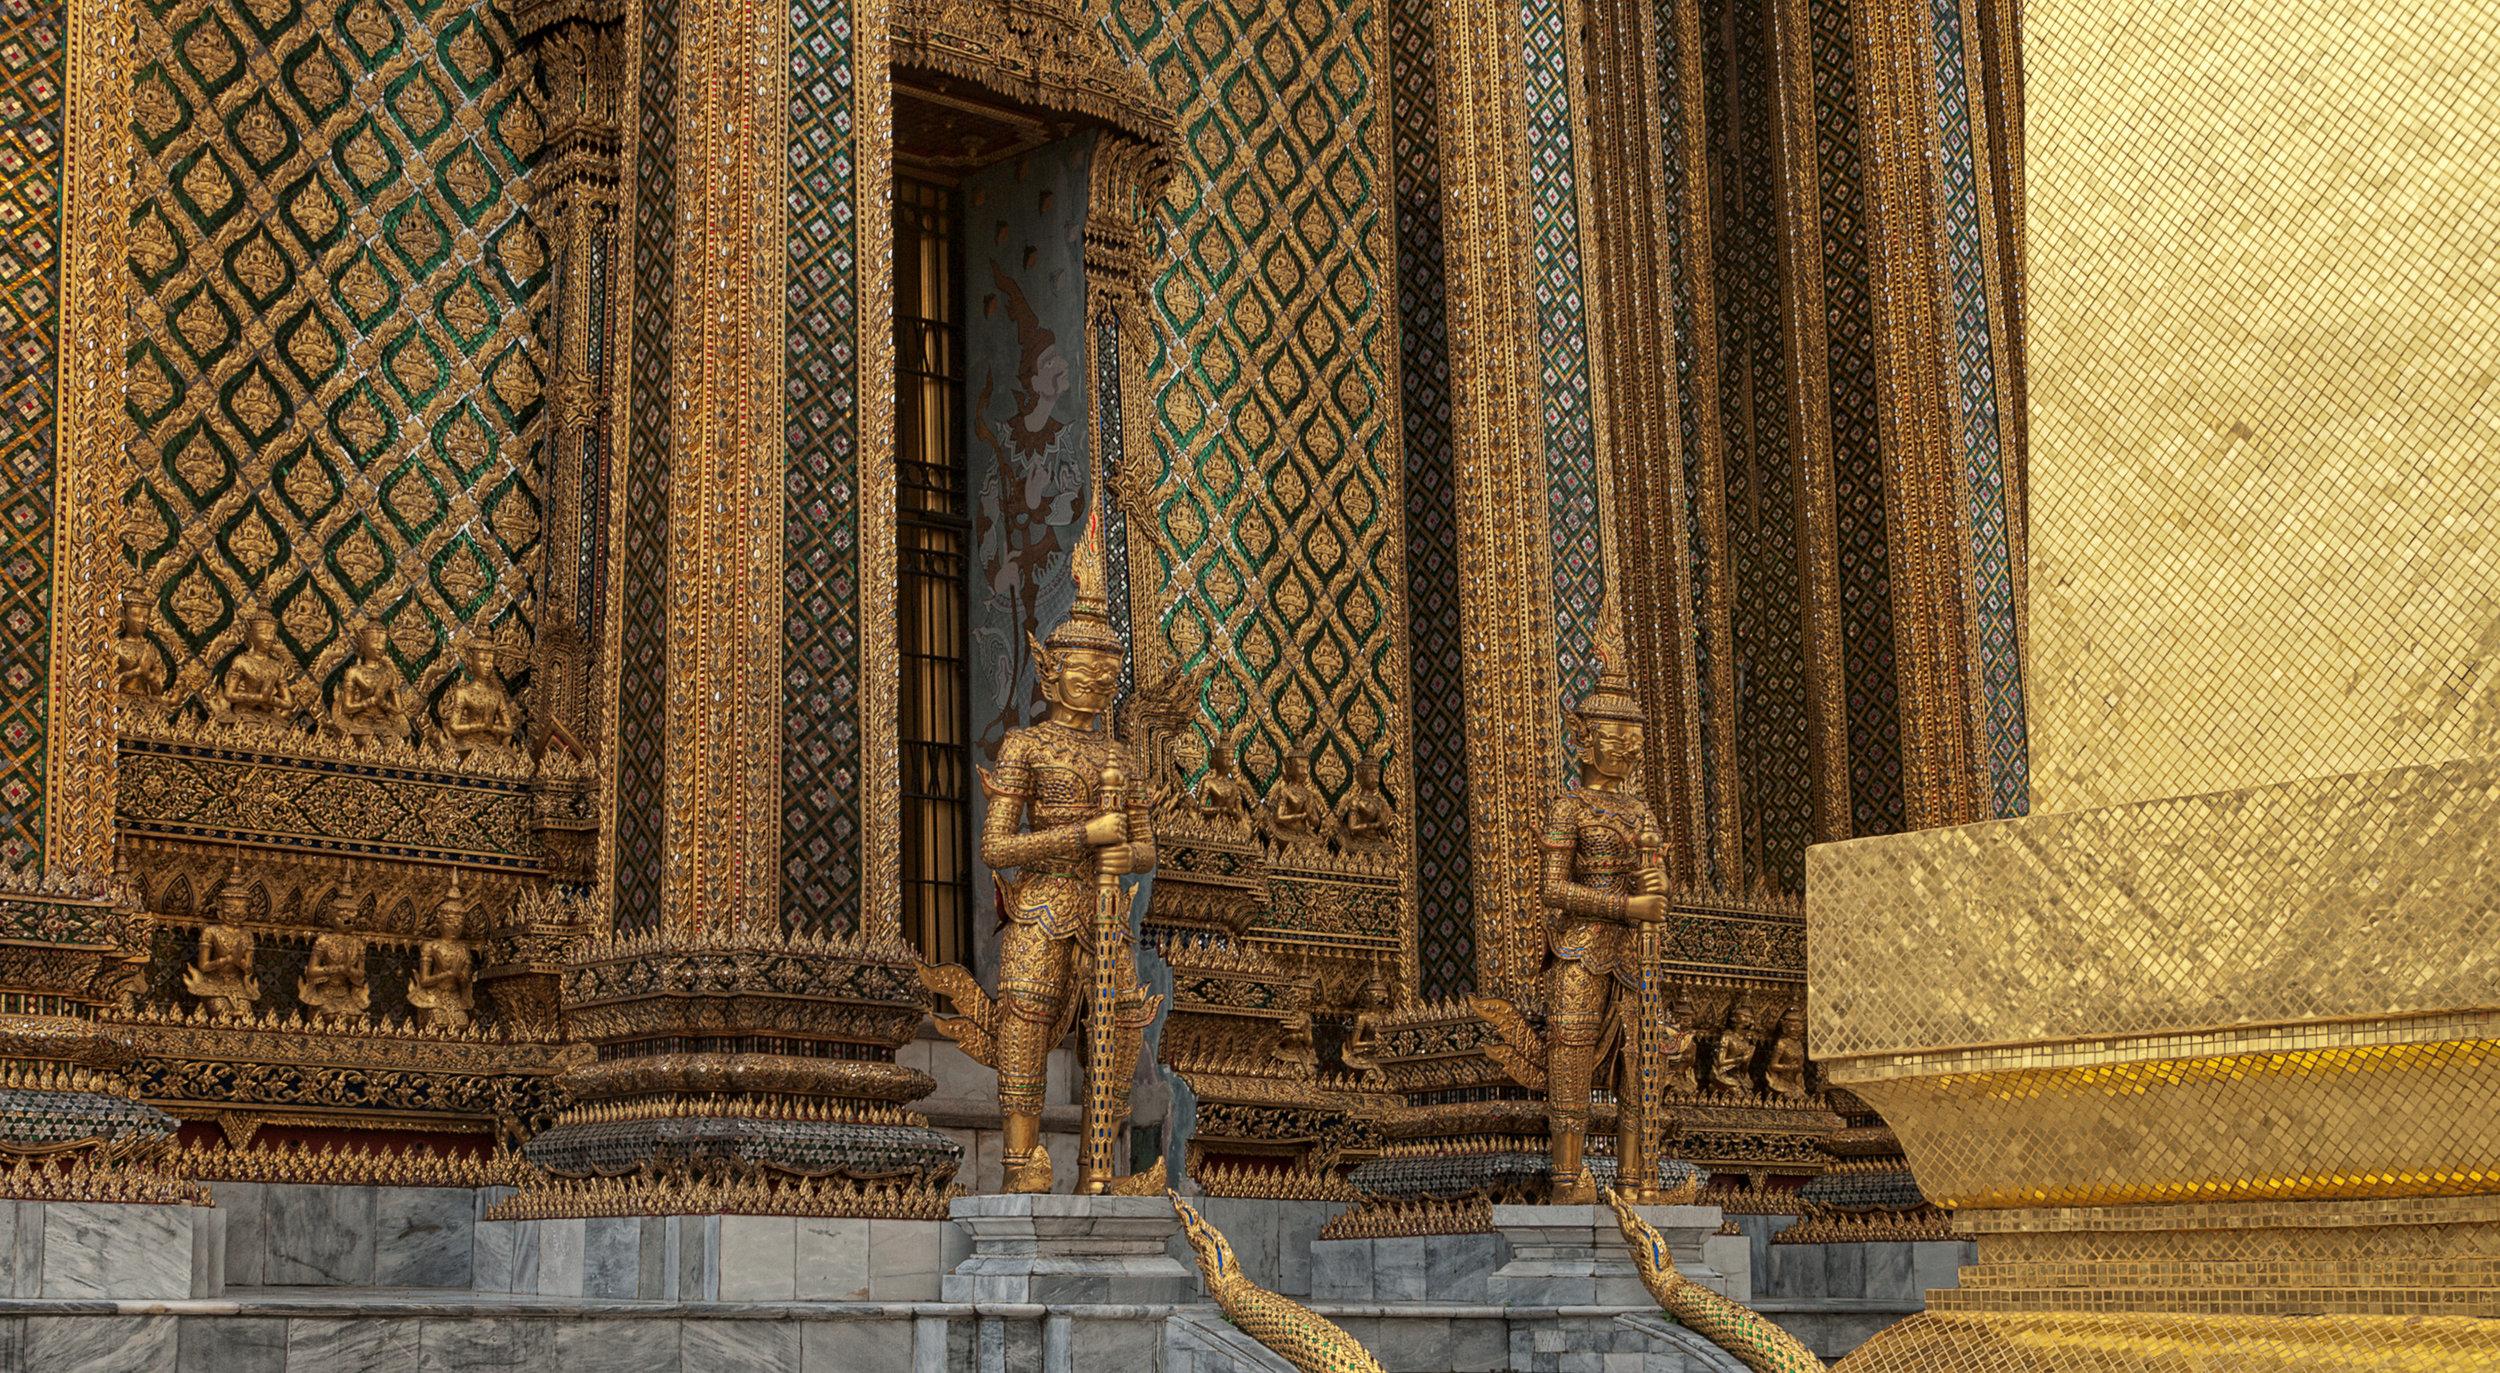 Thailand-John Bardell__DSC3600a.jpg